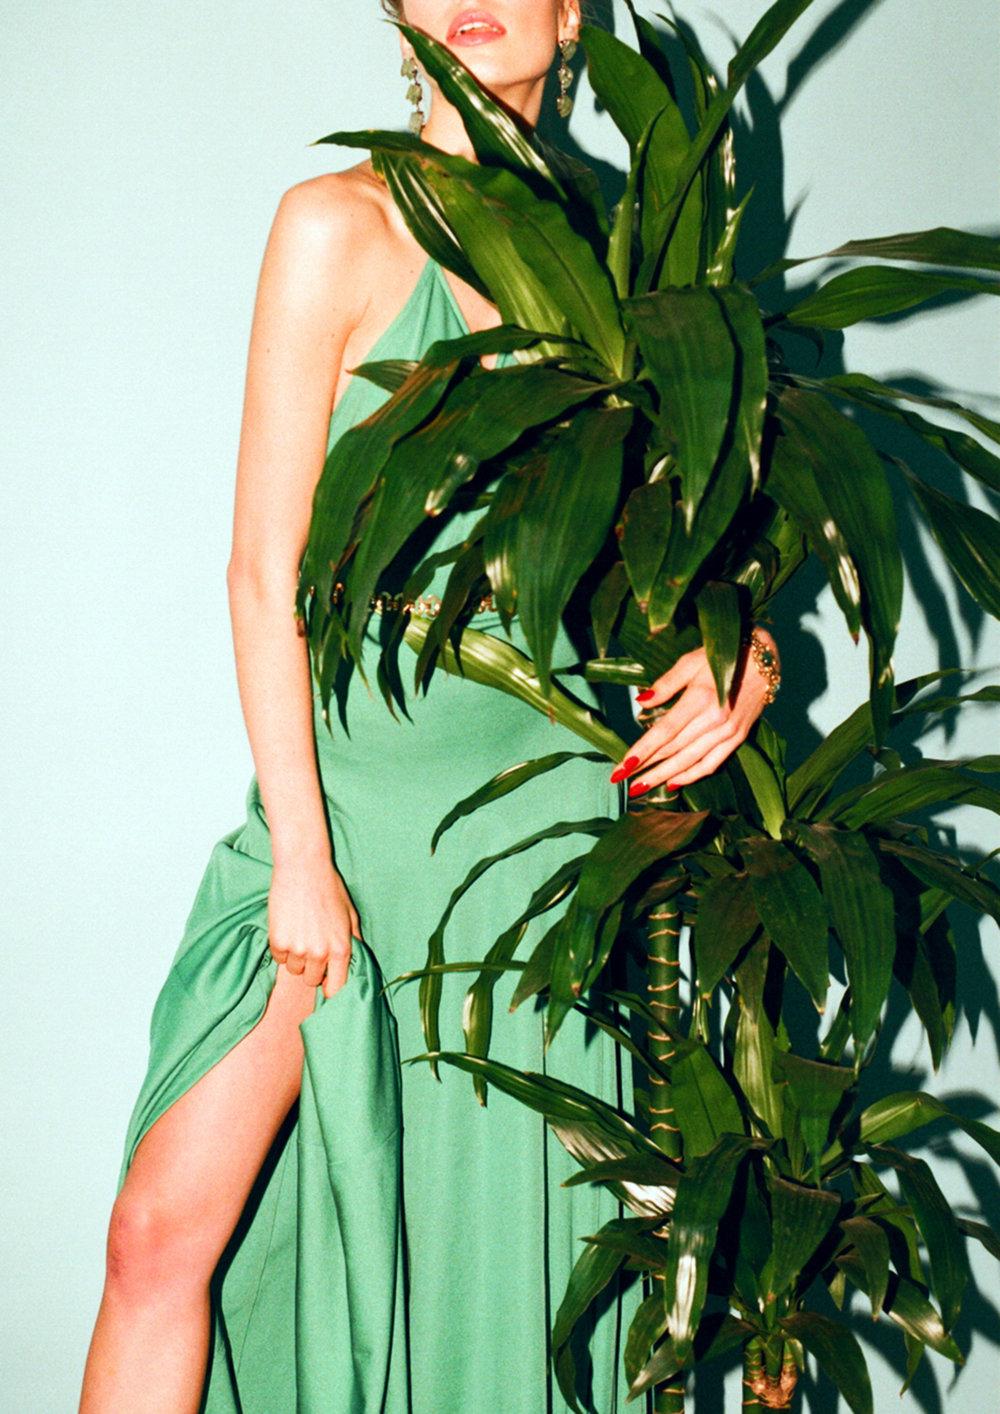 Dress Vintage, Accessories Stylist's Own